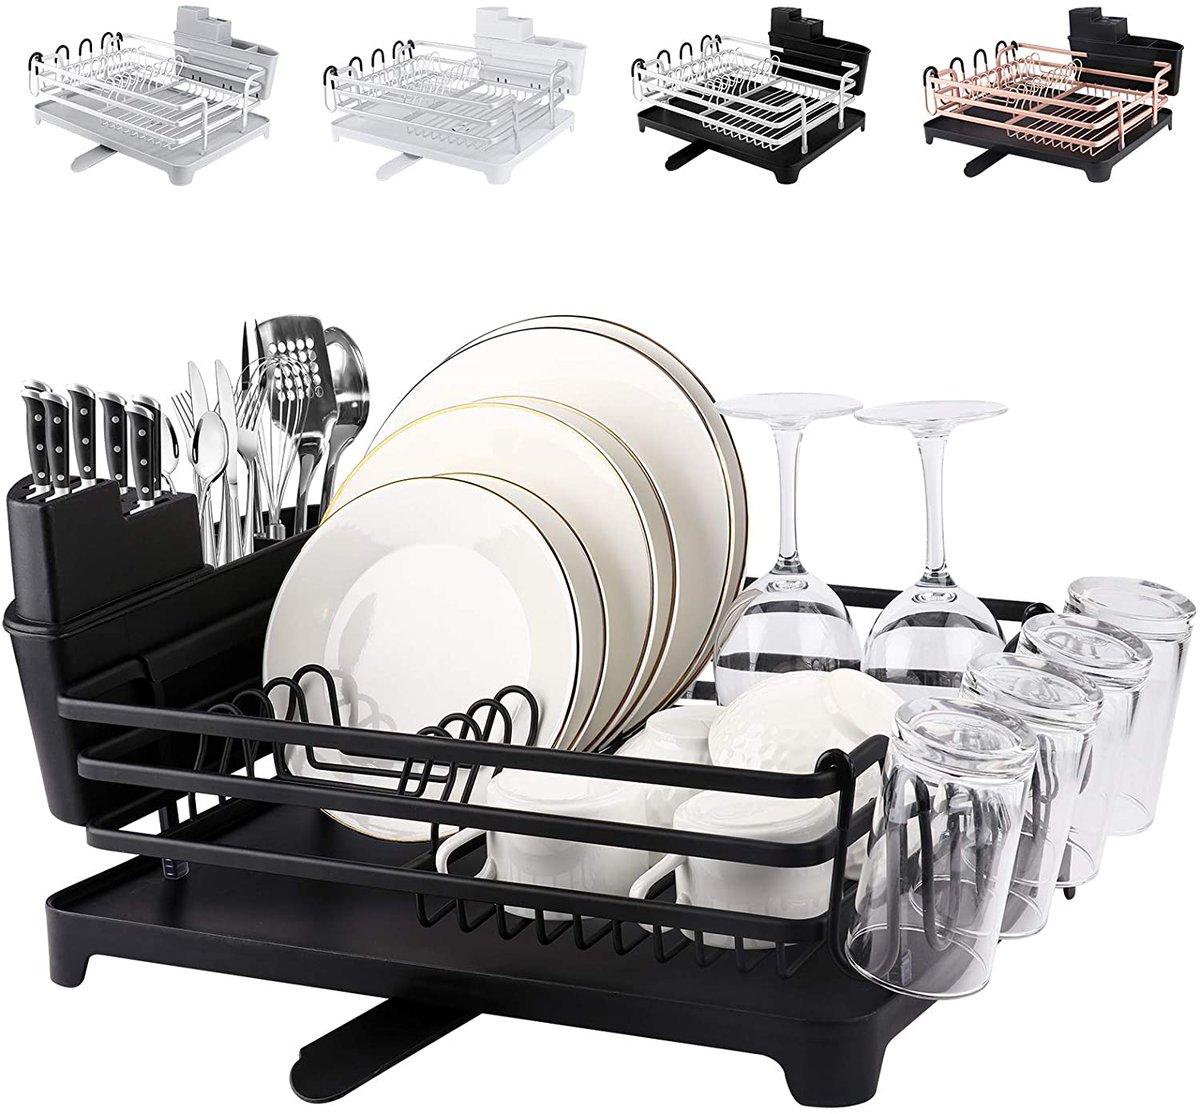 ROTTOGOON Aluminum Dish Drying Rack  Only $28.04!